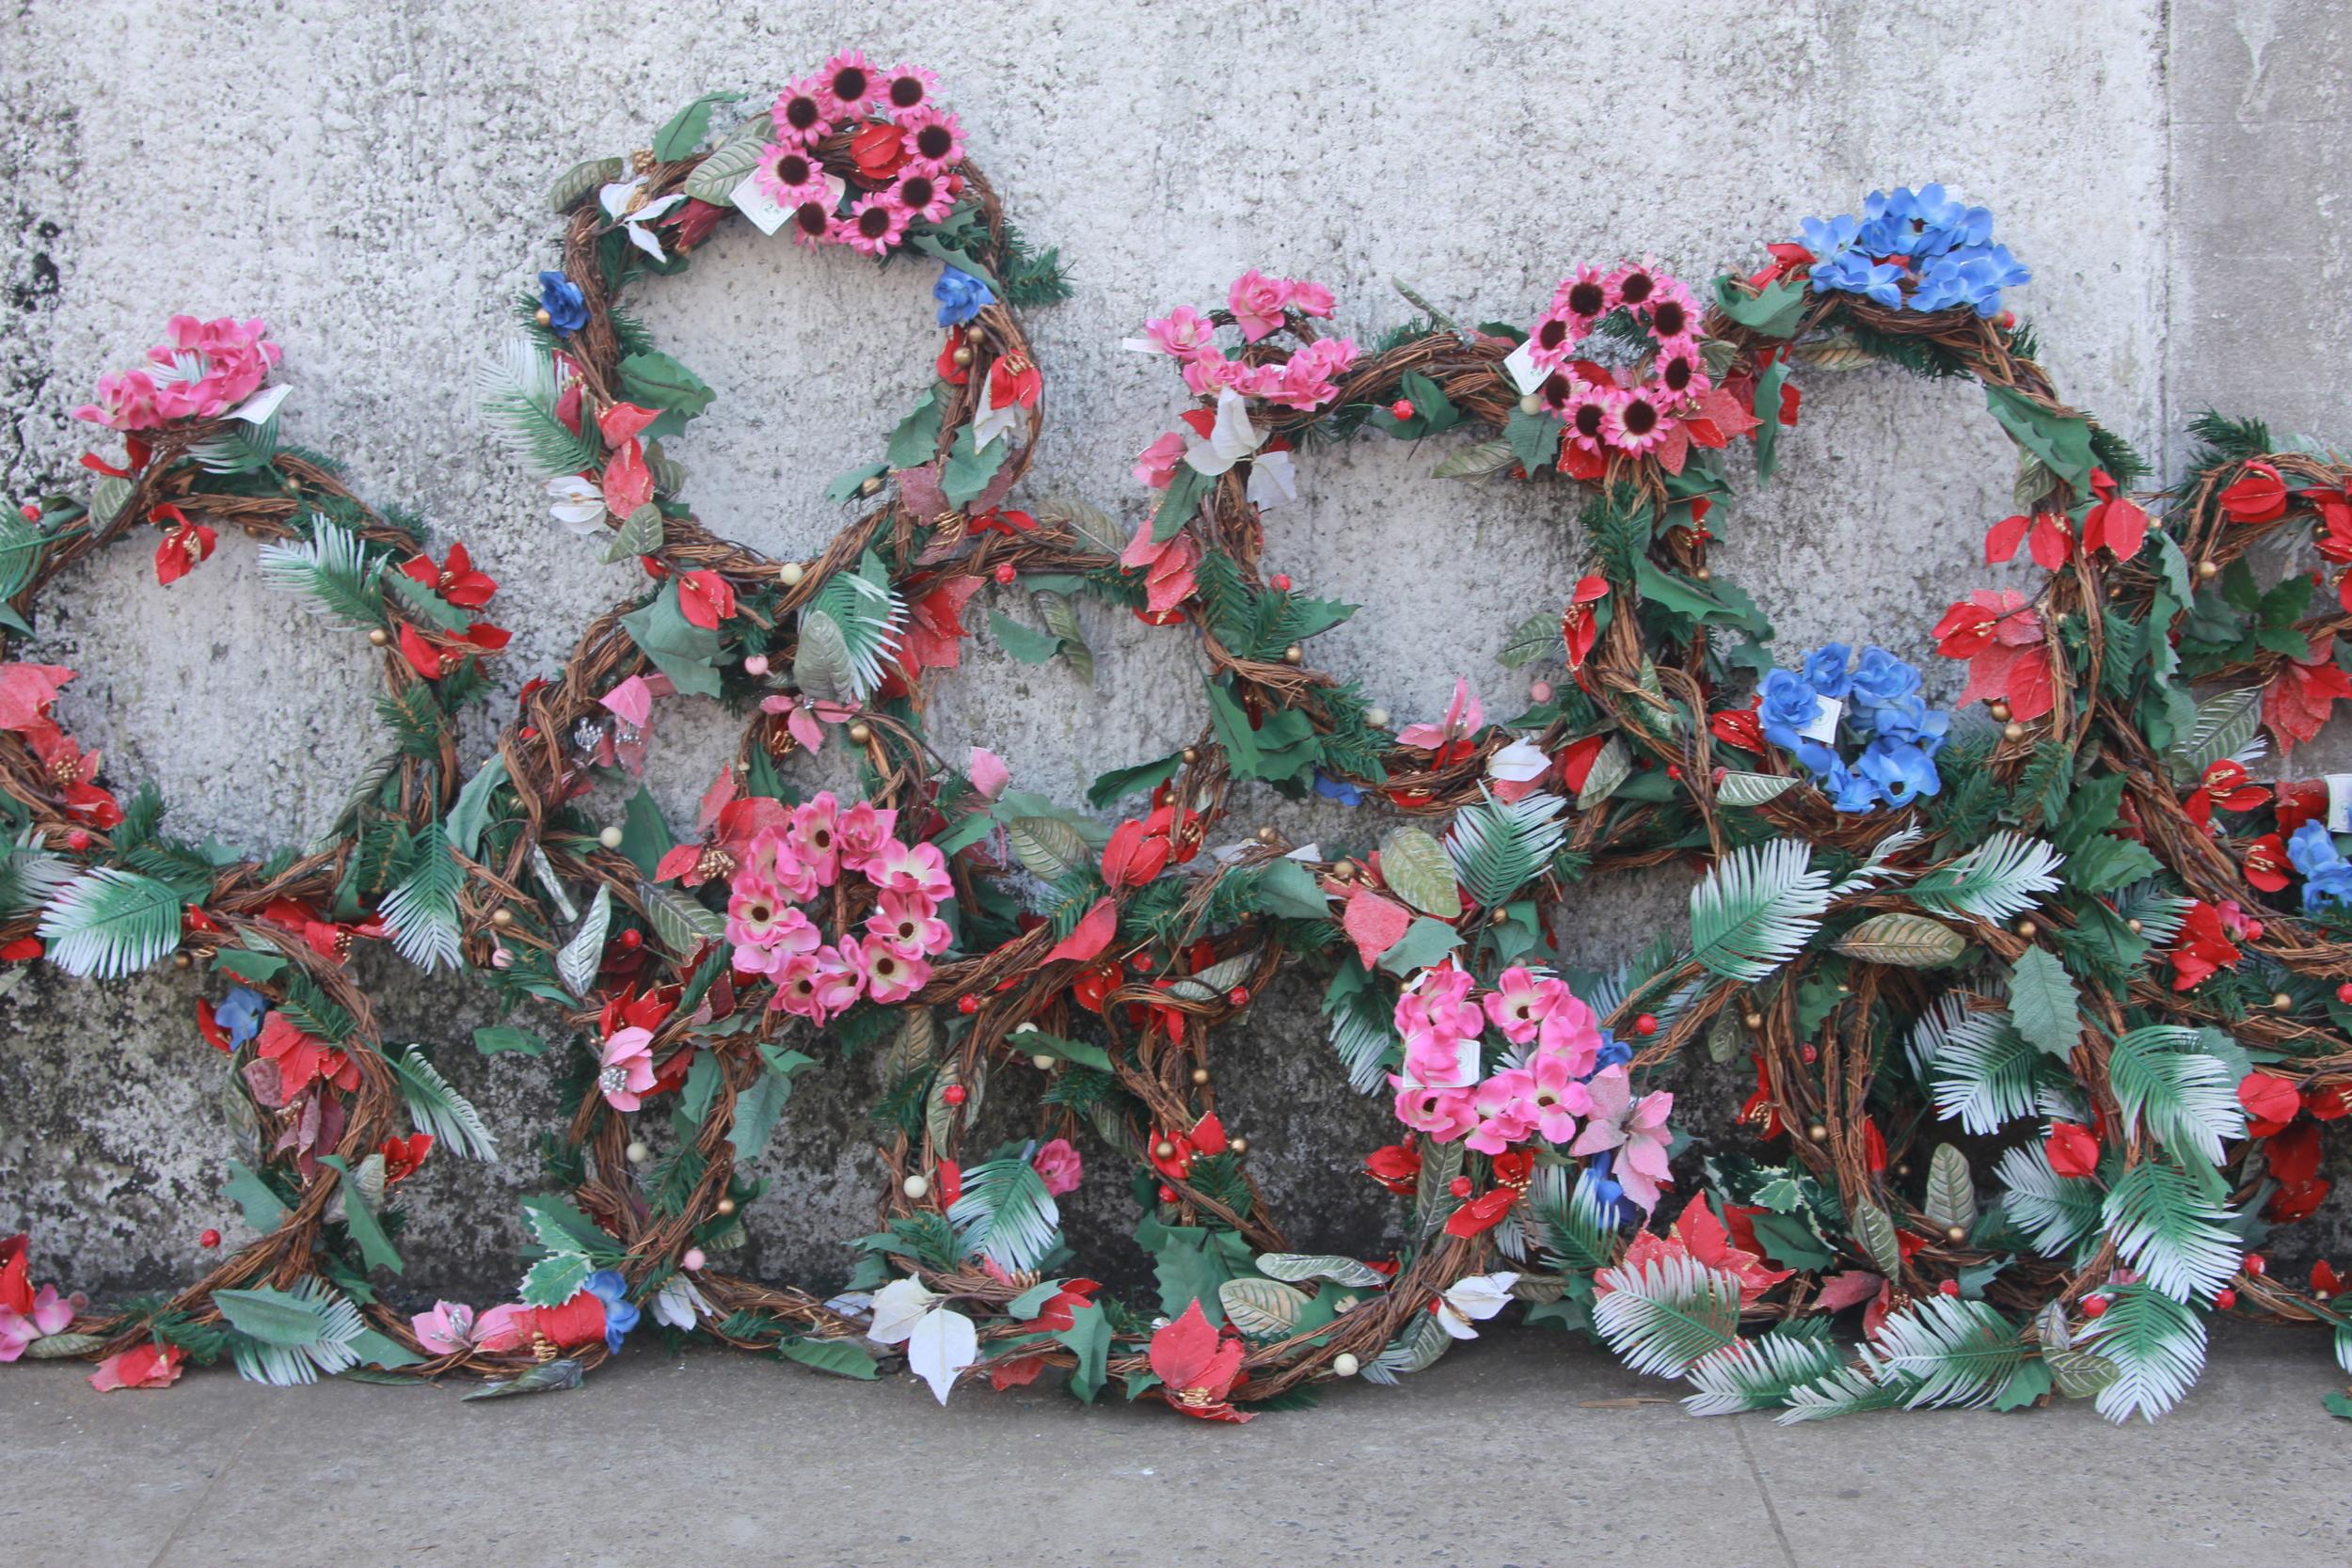 Center Street Cemetery, Monrovia. (Nurudeen Sanni/IFRC)